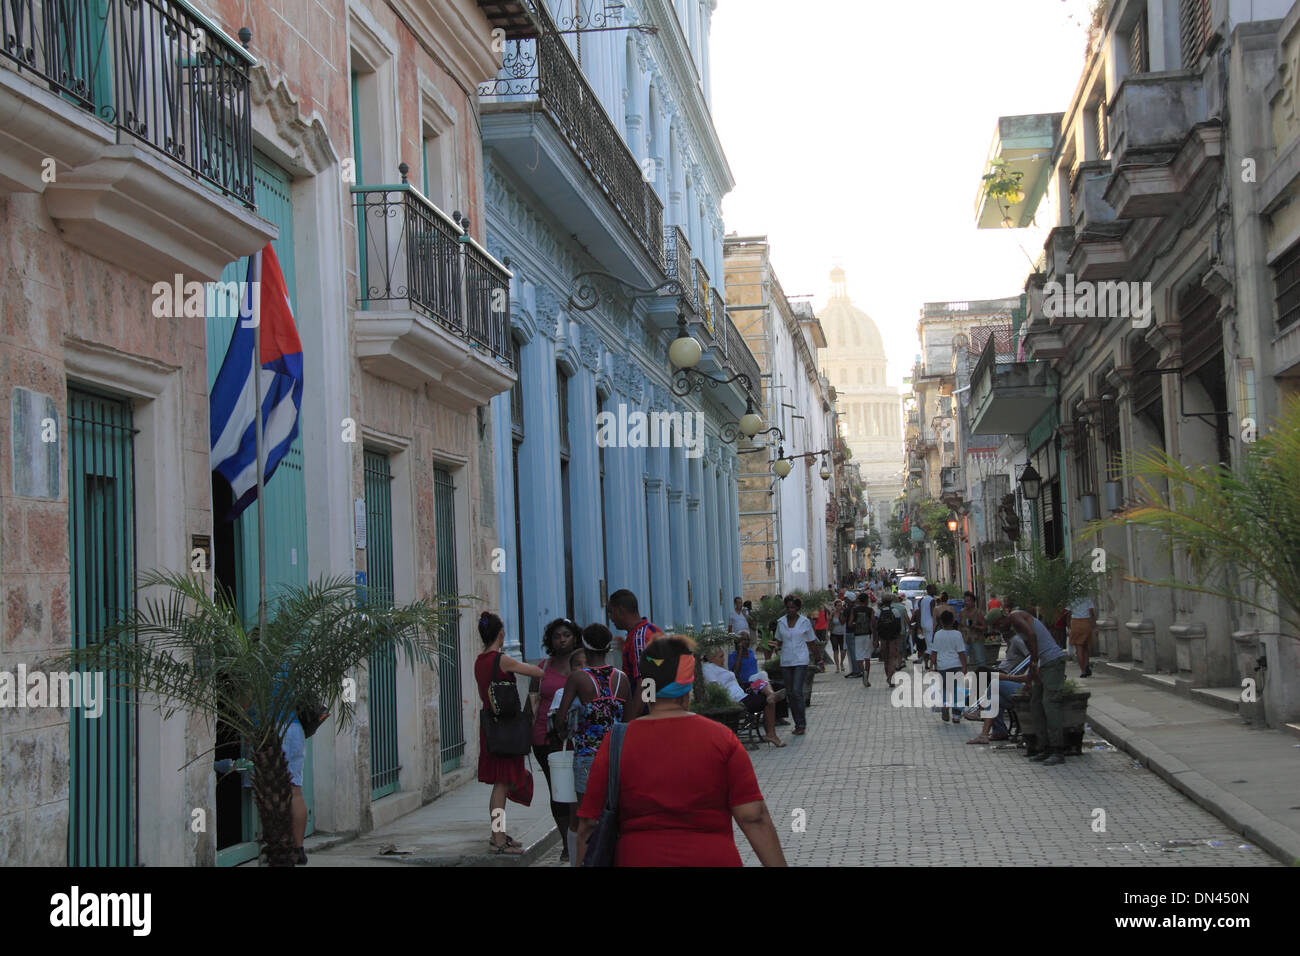 Calle Brasil (Teniente Rey), Old Havana (La Habana Vieja), Cuba, Caribbean Sea, Central America - Stock Image